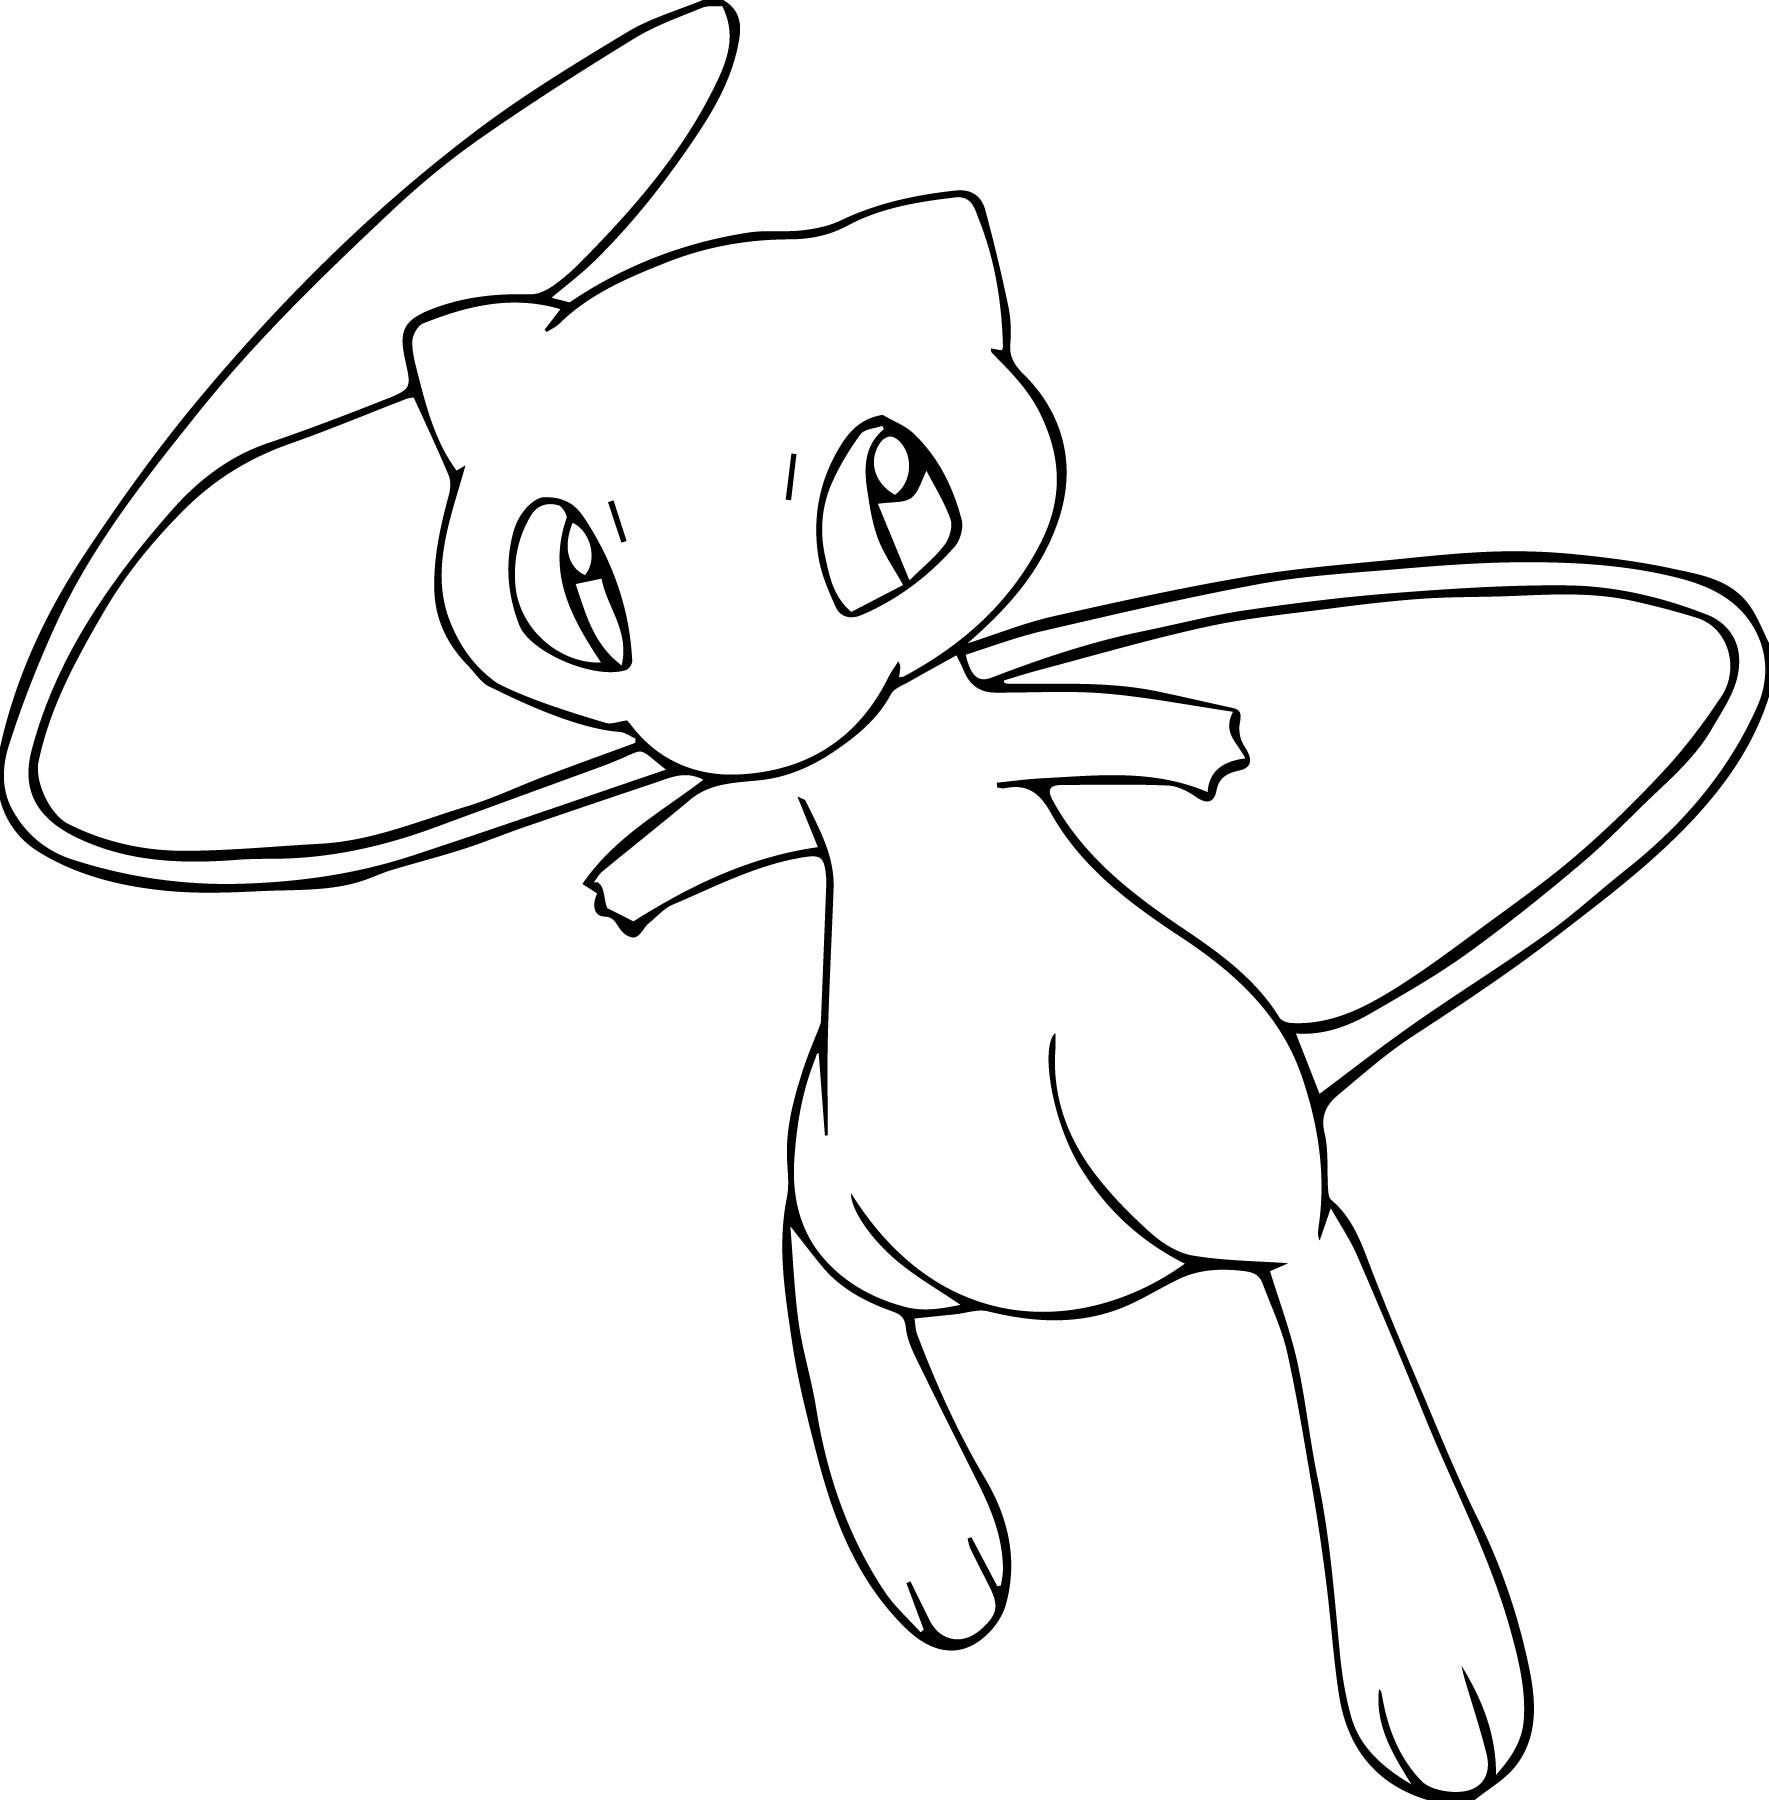 Pokemon Mew Drawing at GetDrawings | Free download